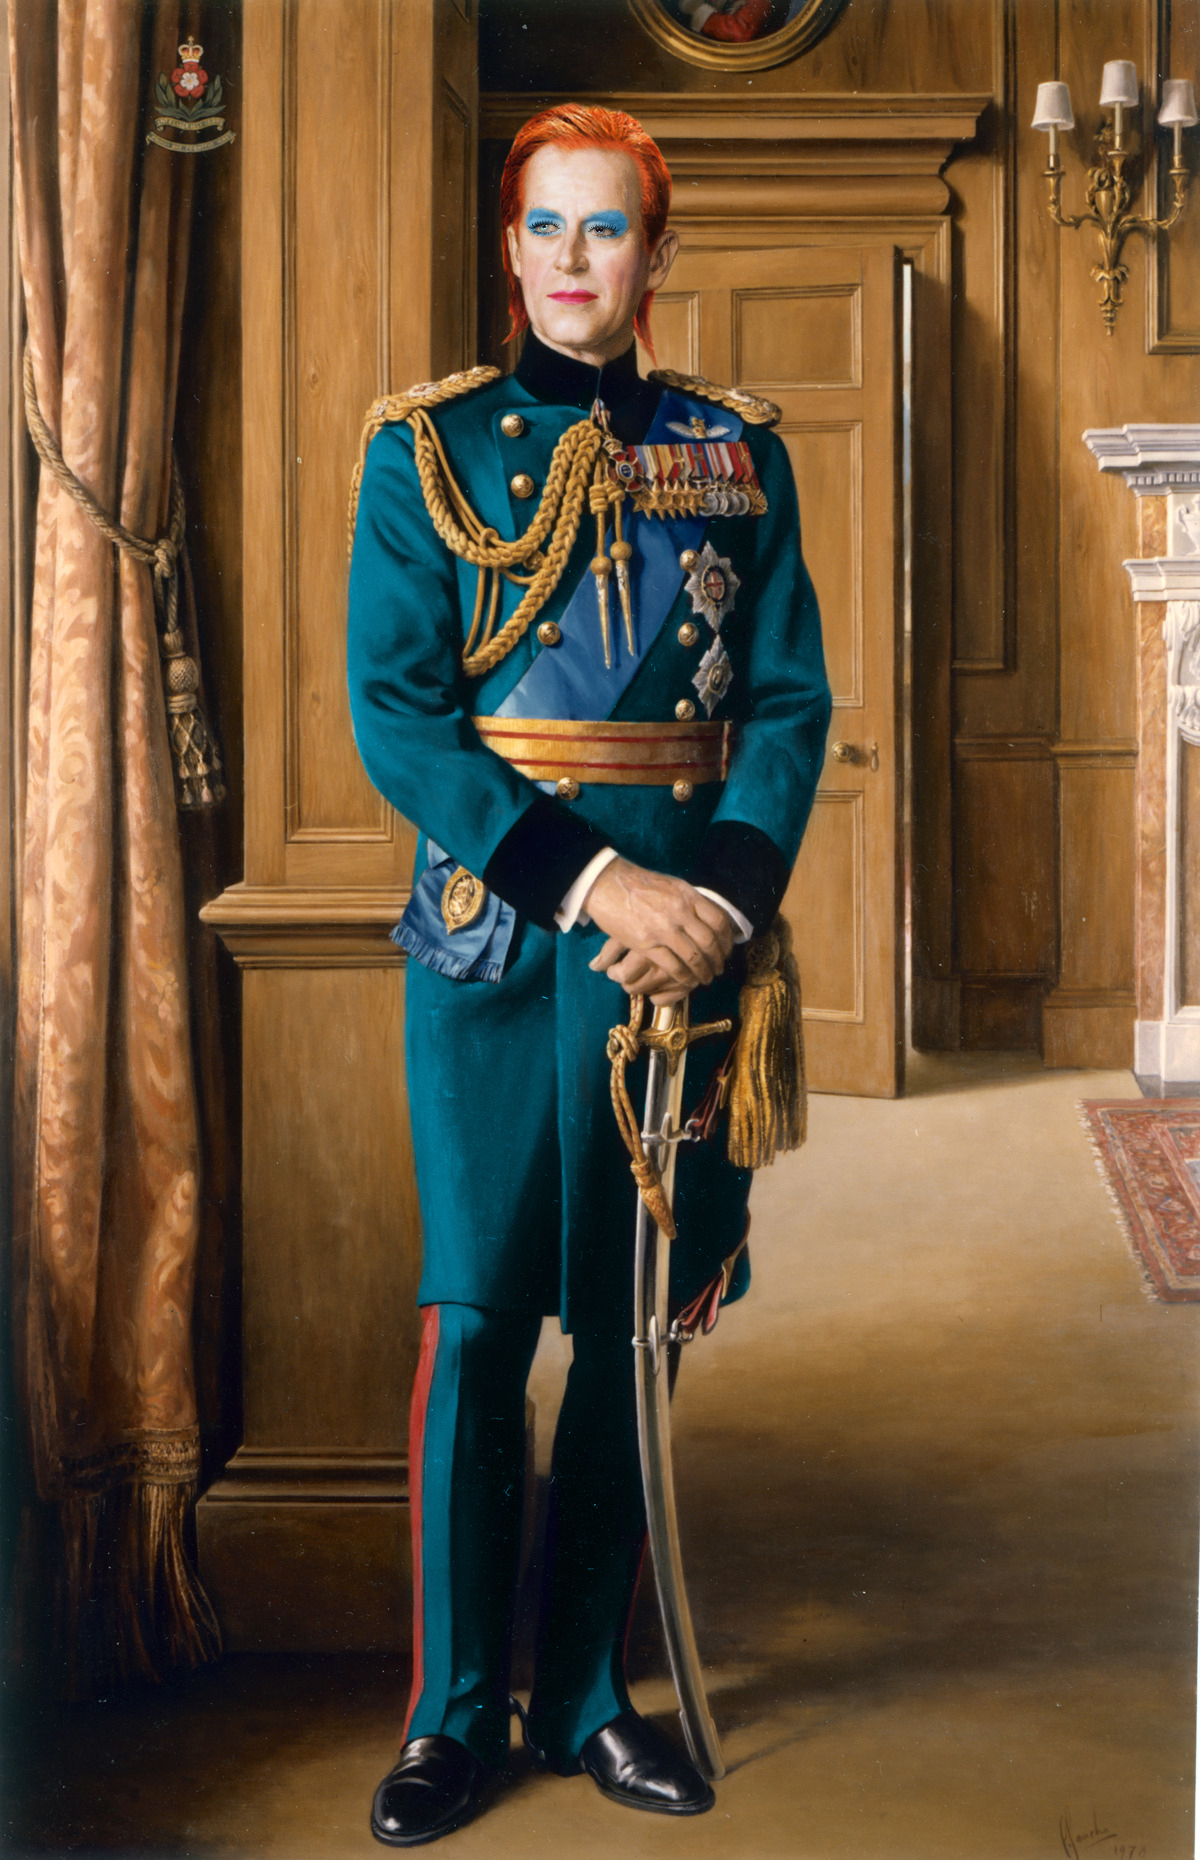 Prince Philip x David Bowie by Sassicism / Harry J Bartlett